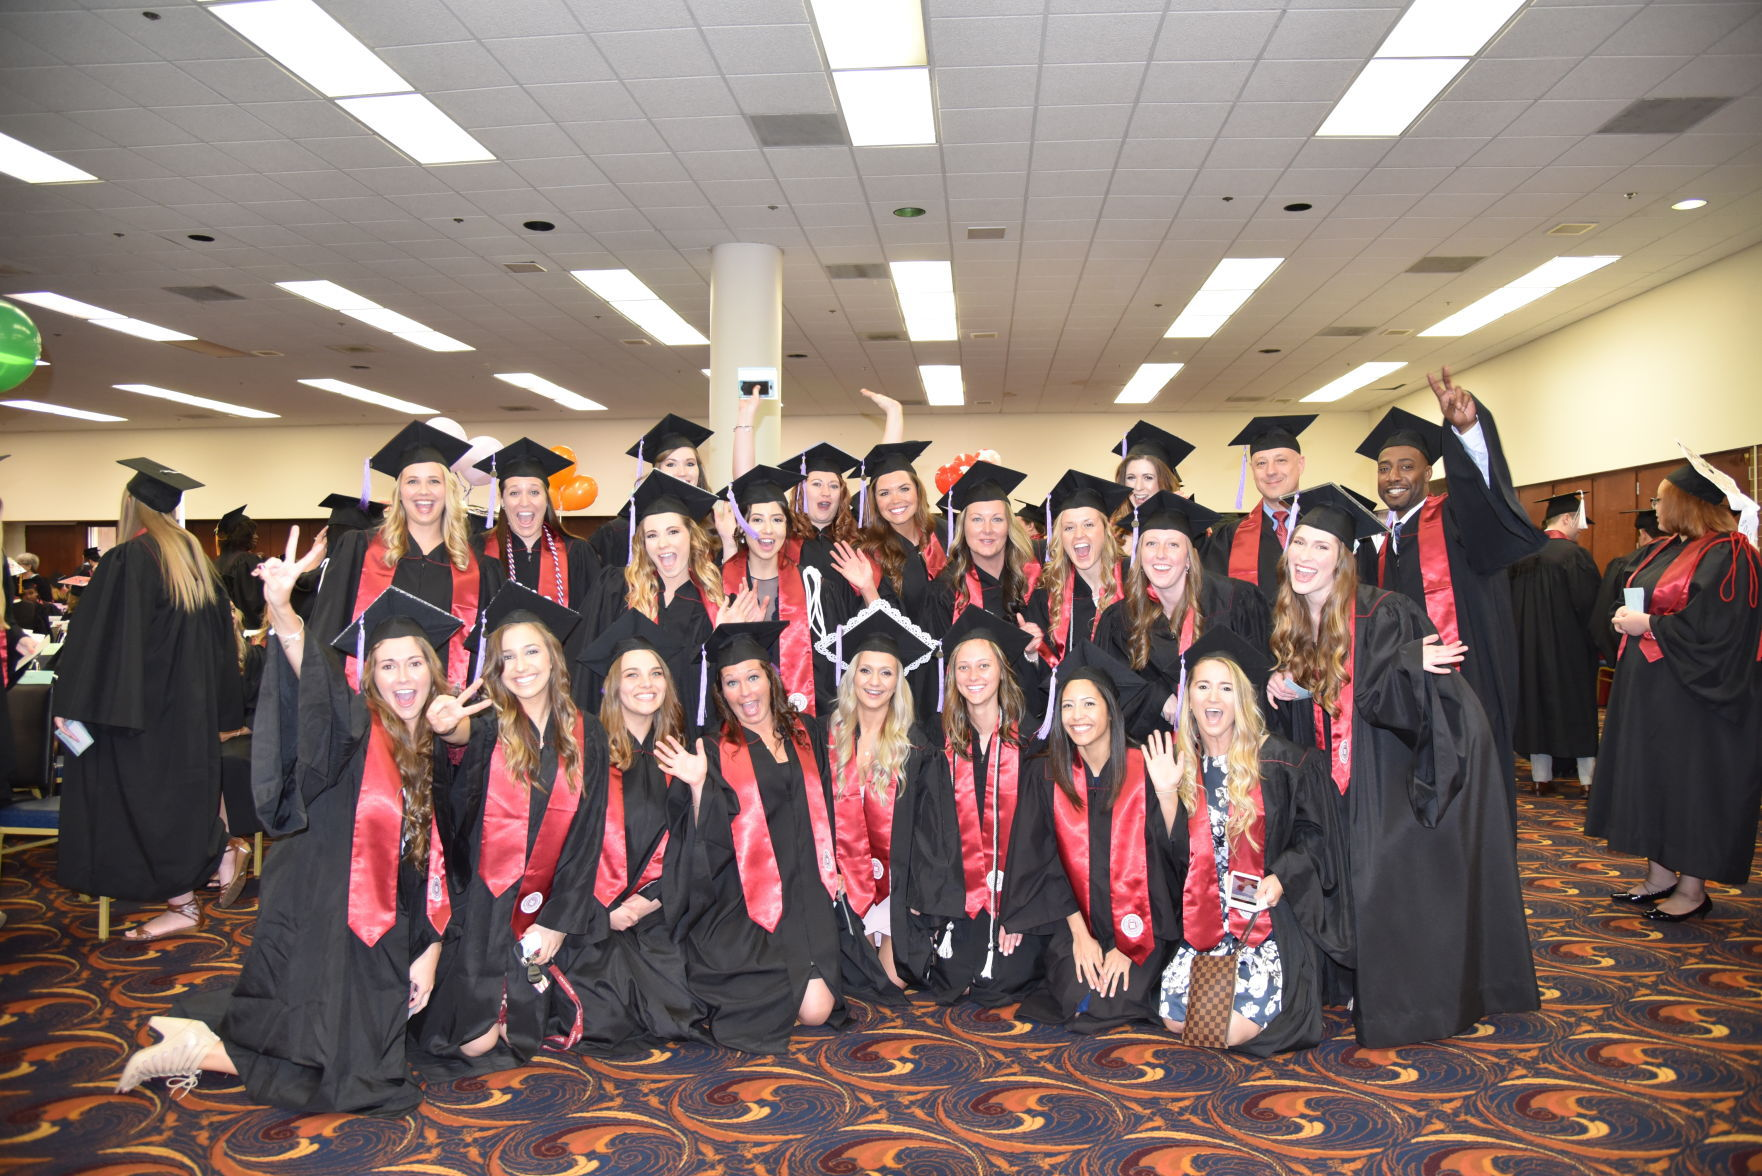 DSC2262JPG Faces of the Region Indiana University